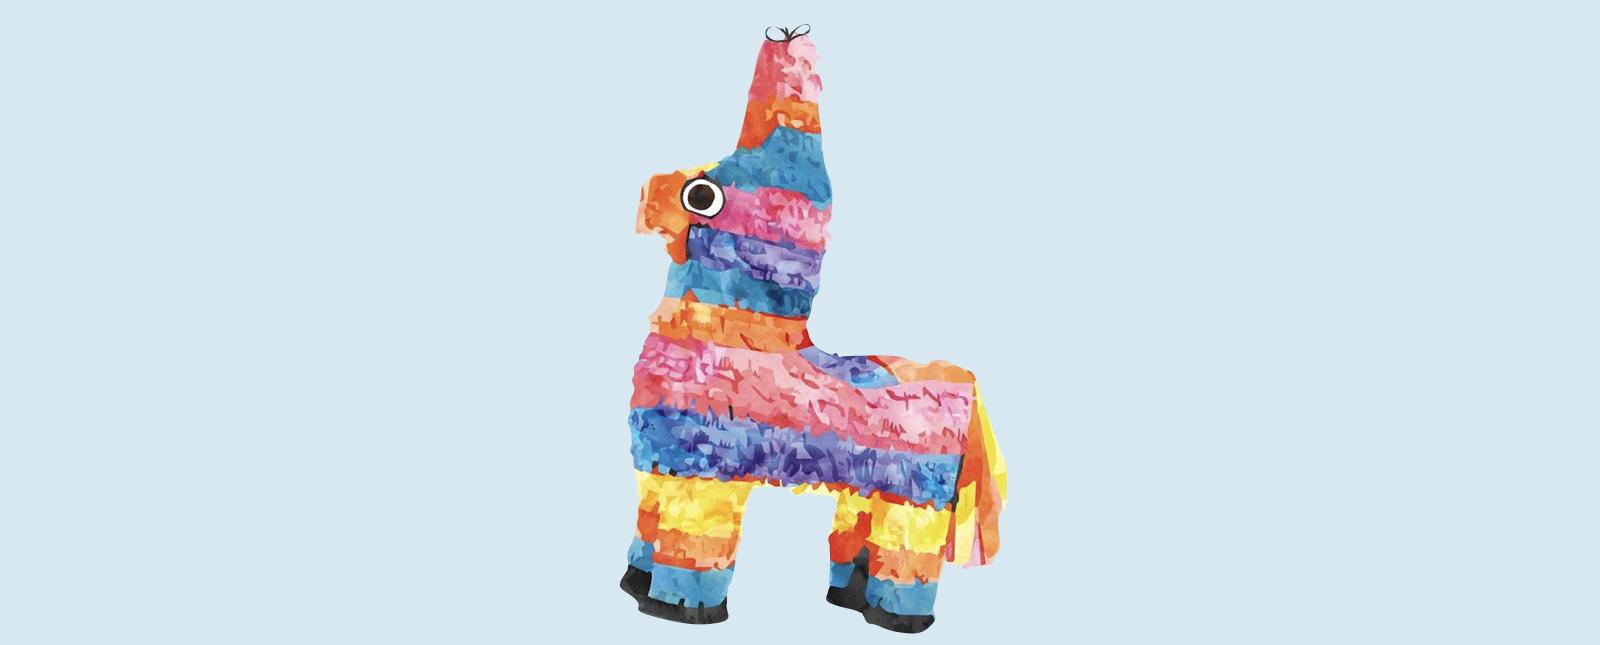 donkey-pinata-design-the-history-behind-mexican-totem